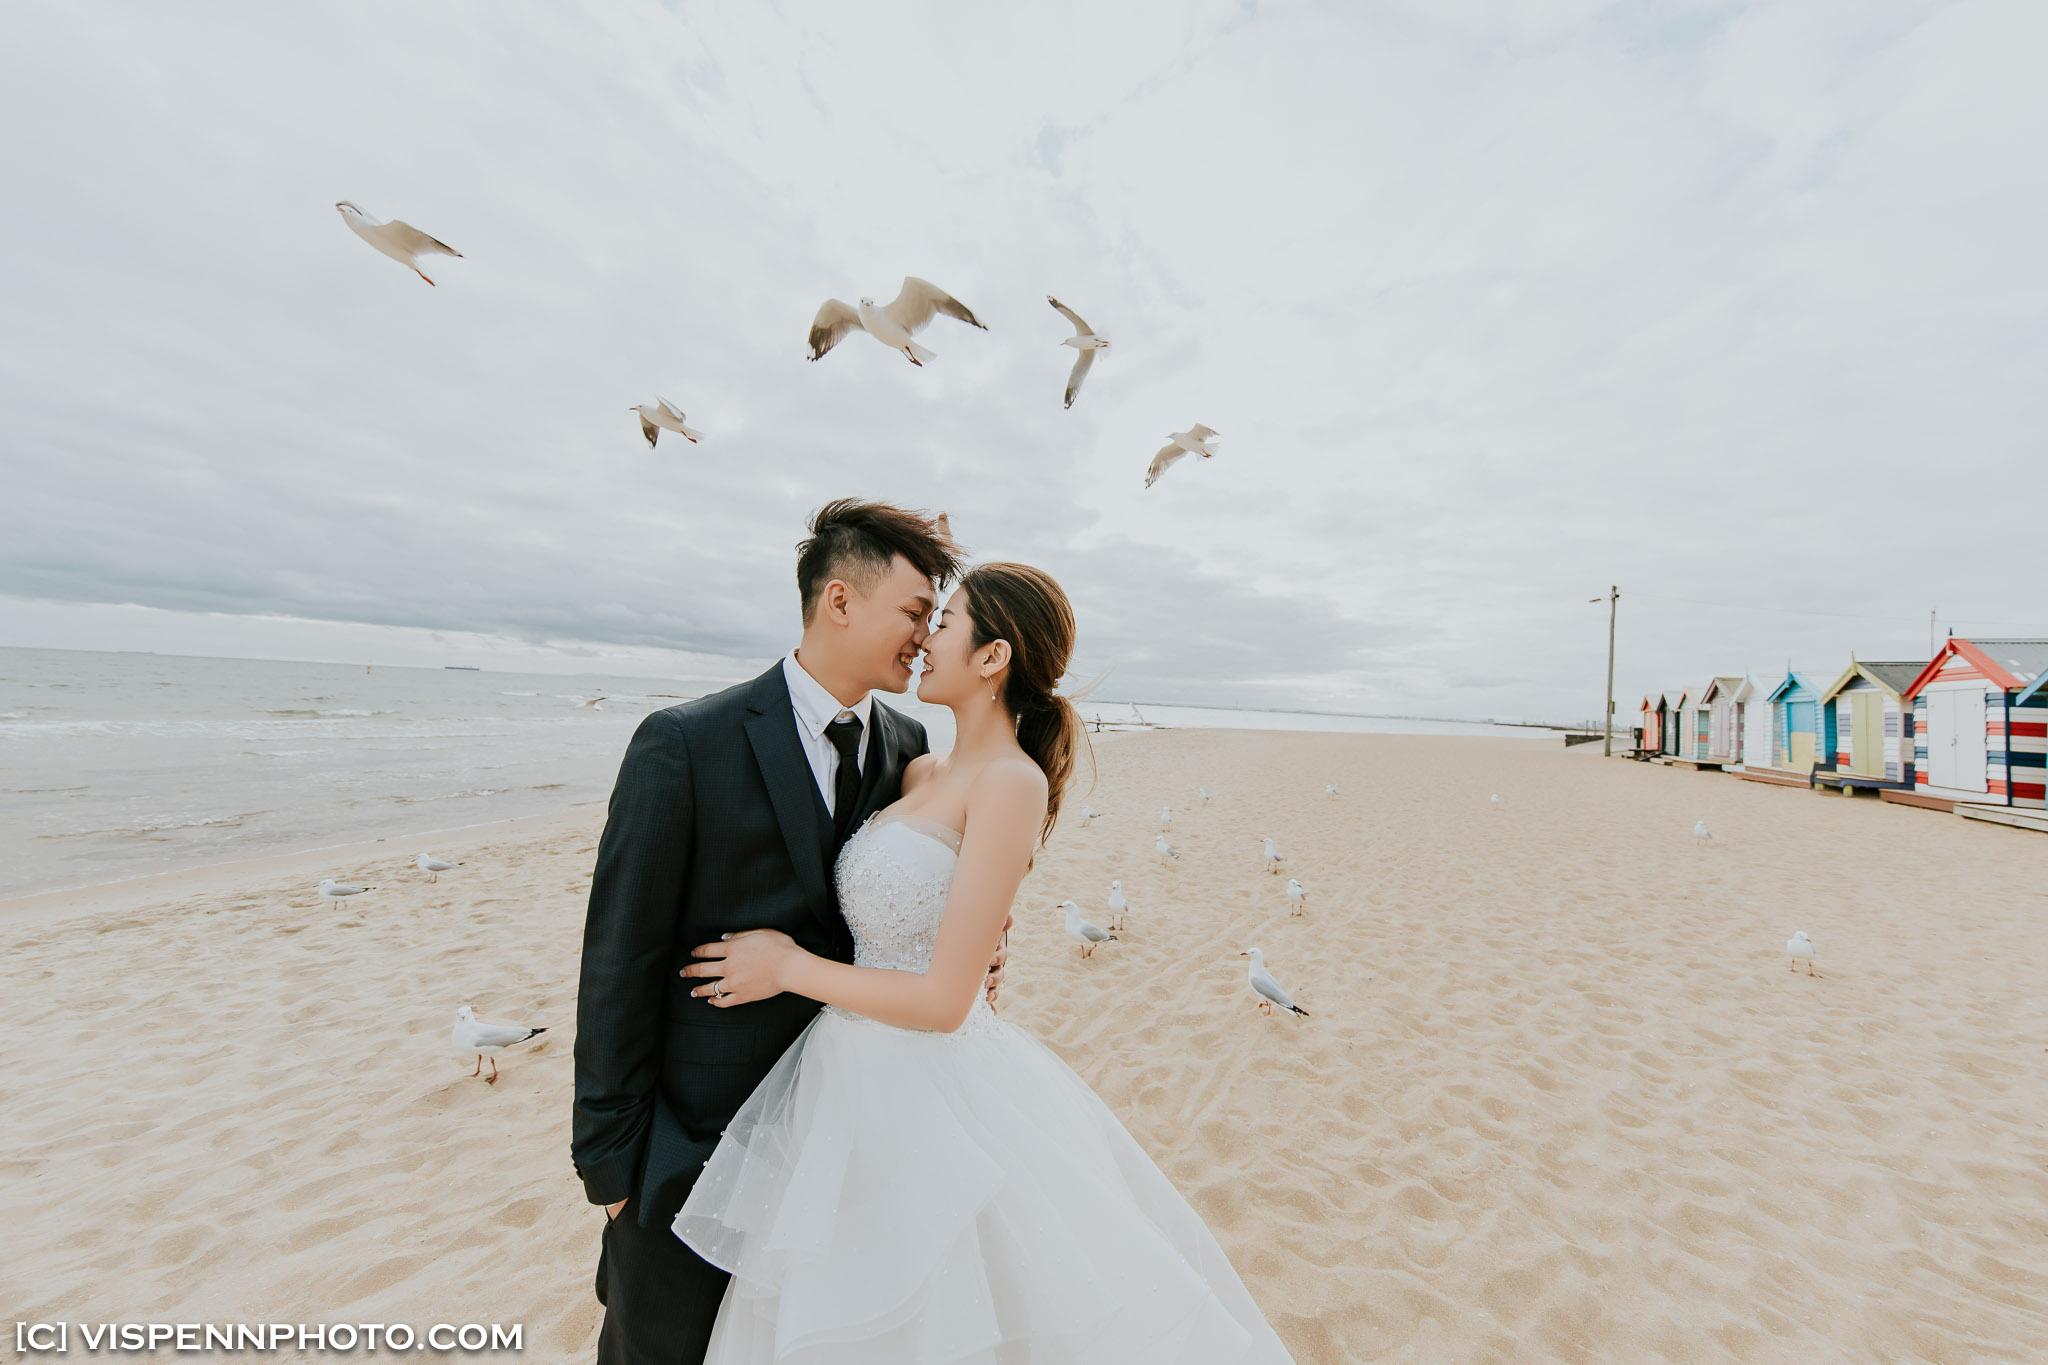 PRE WEDDING Photography Melbourne VISPENN 墨尔本 婚纱照 结婚照 婚纱摄影 GiGi 7837 EOSR VISPENN